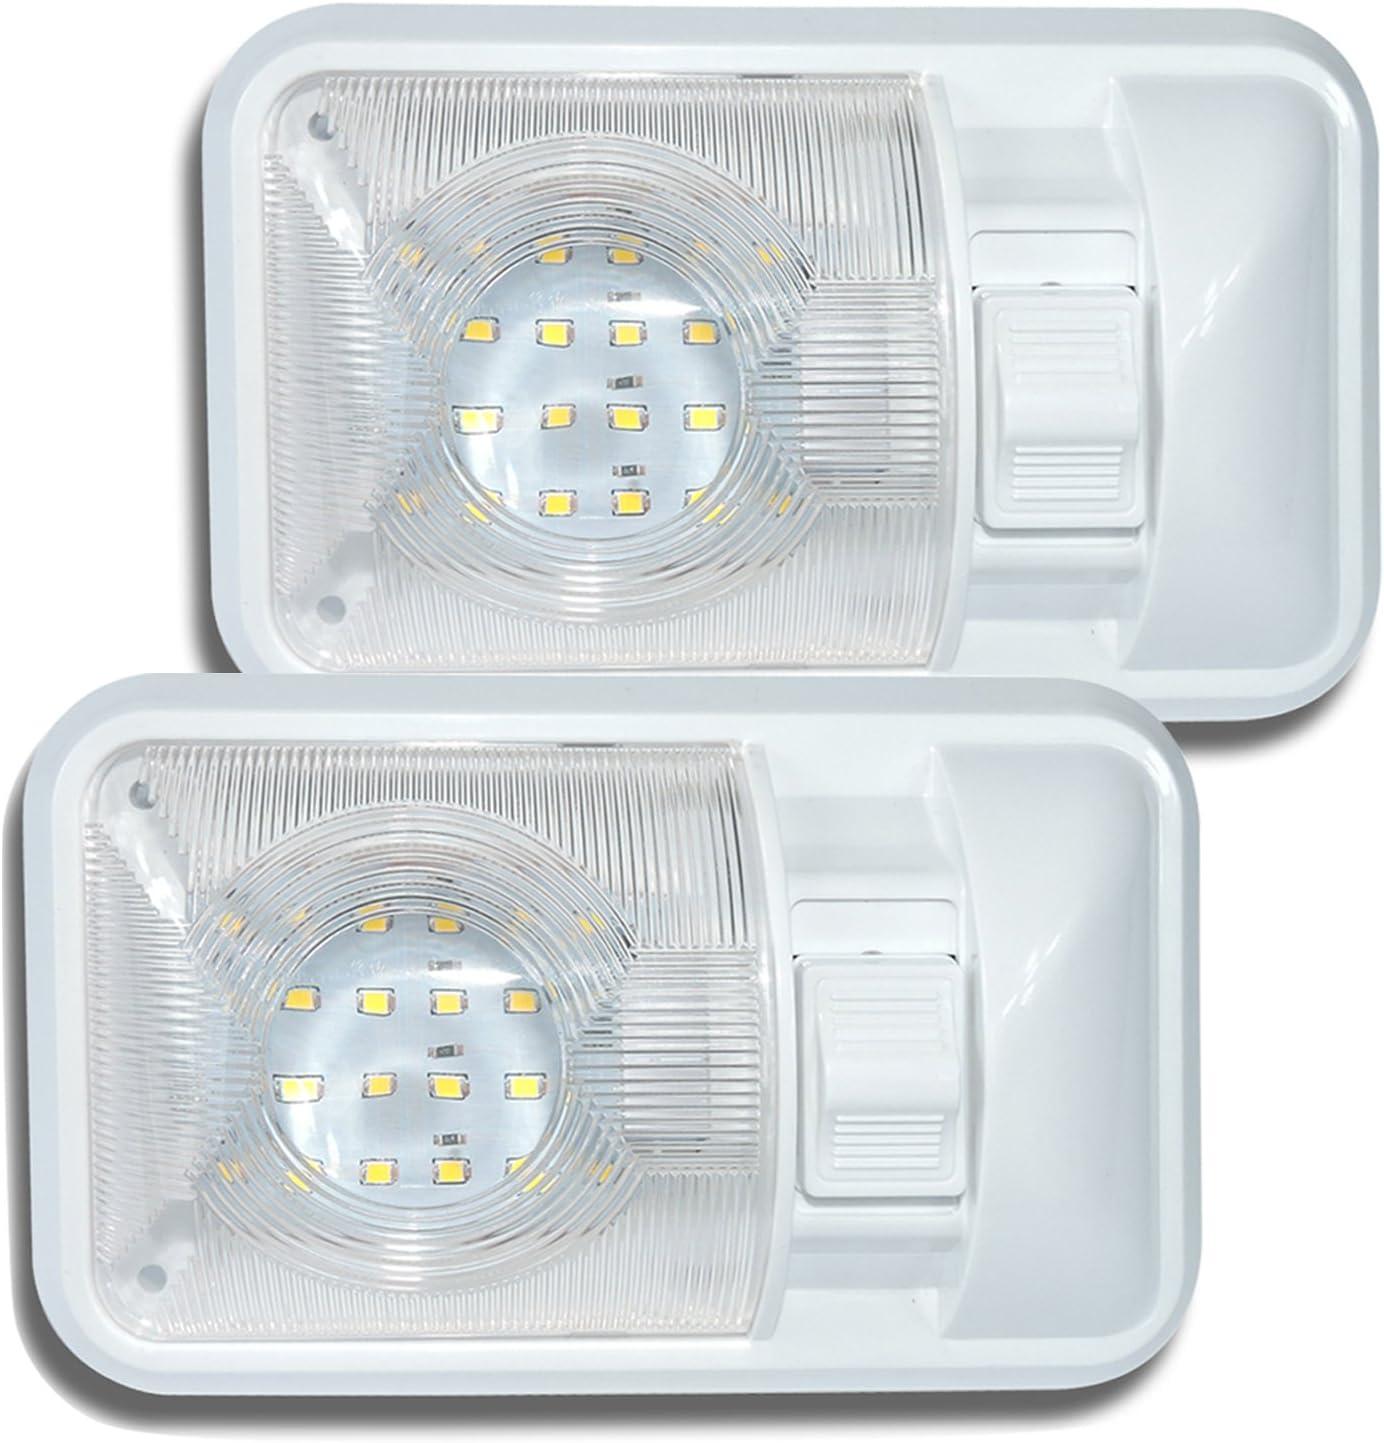 amazon com lighting rv parts \u0026 accessories automotive exteriorleisure led 2 pack 12v rv ceiling dome light rv interior lighting for trailer camper with